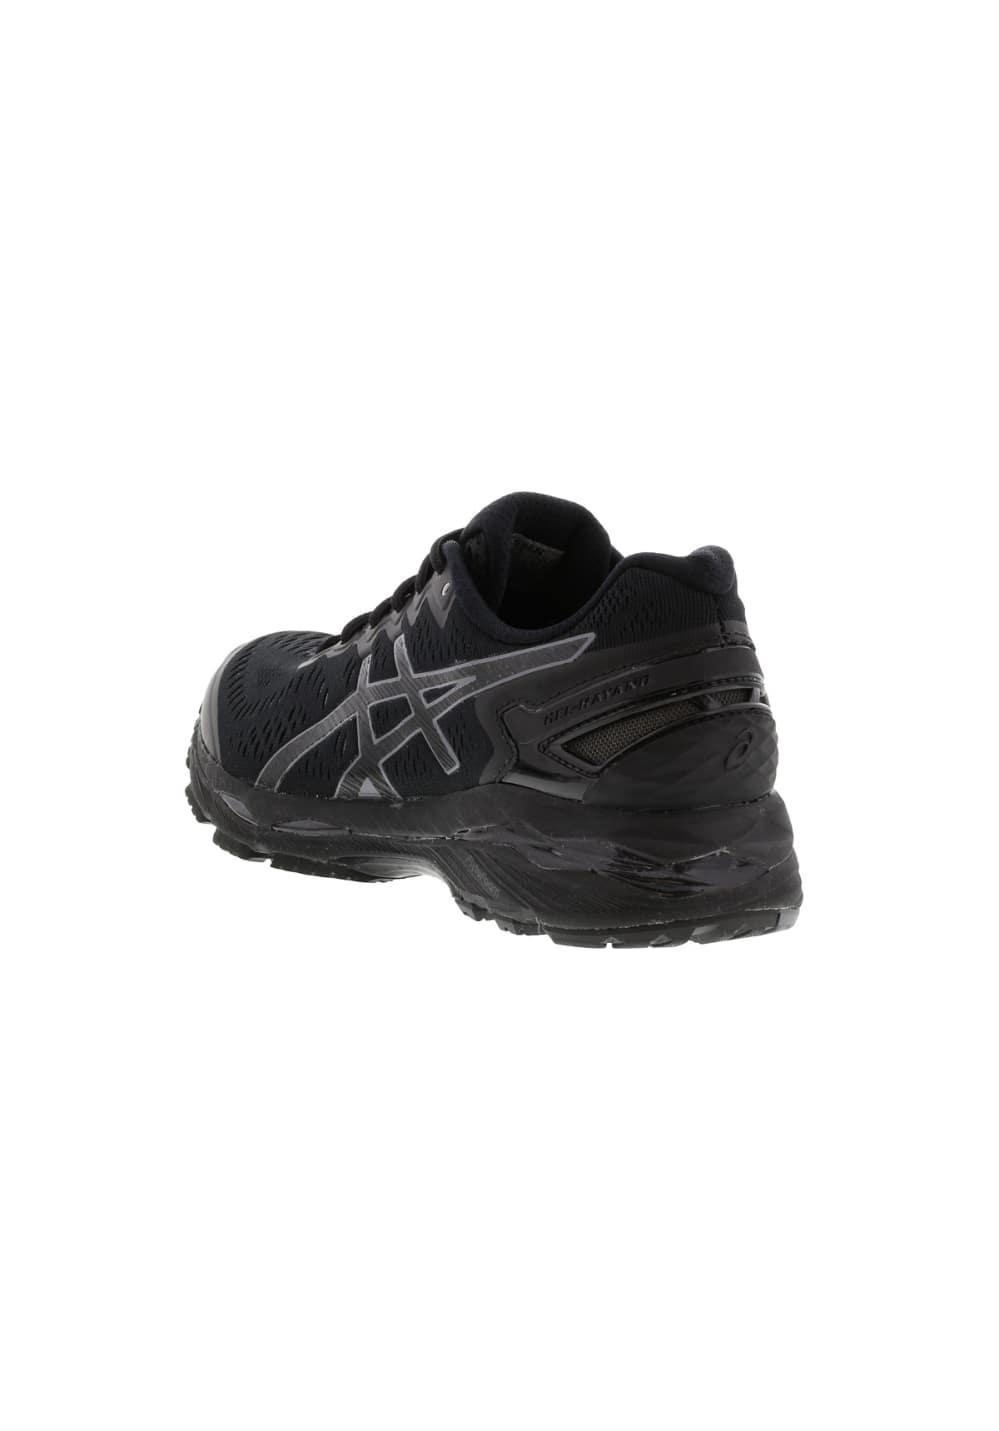 Conception innovante 9e5b5 e3e7d ASICS GEL-Kayano 23 - Running shoes for Women - Black